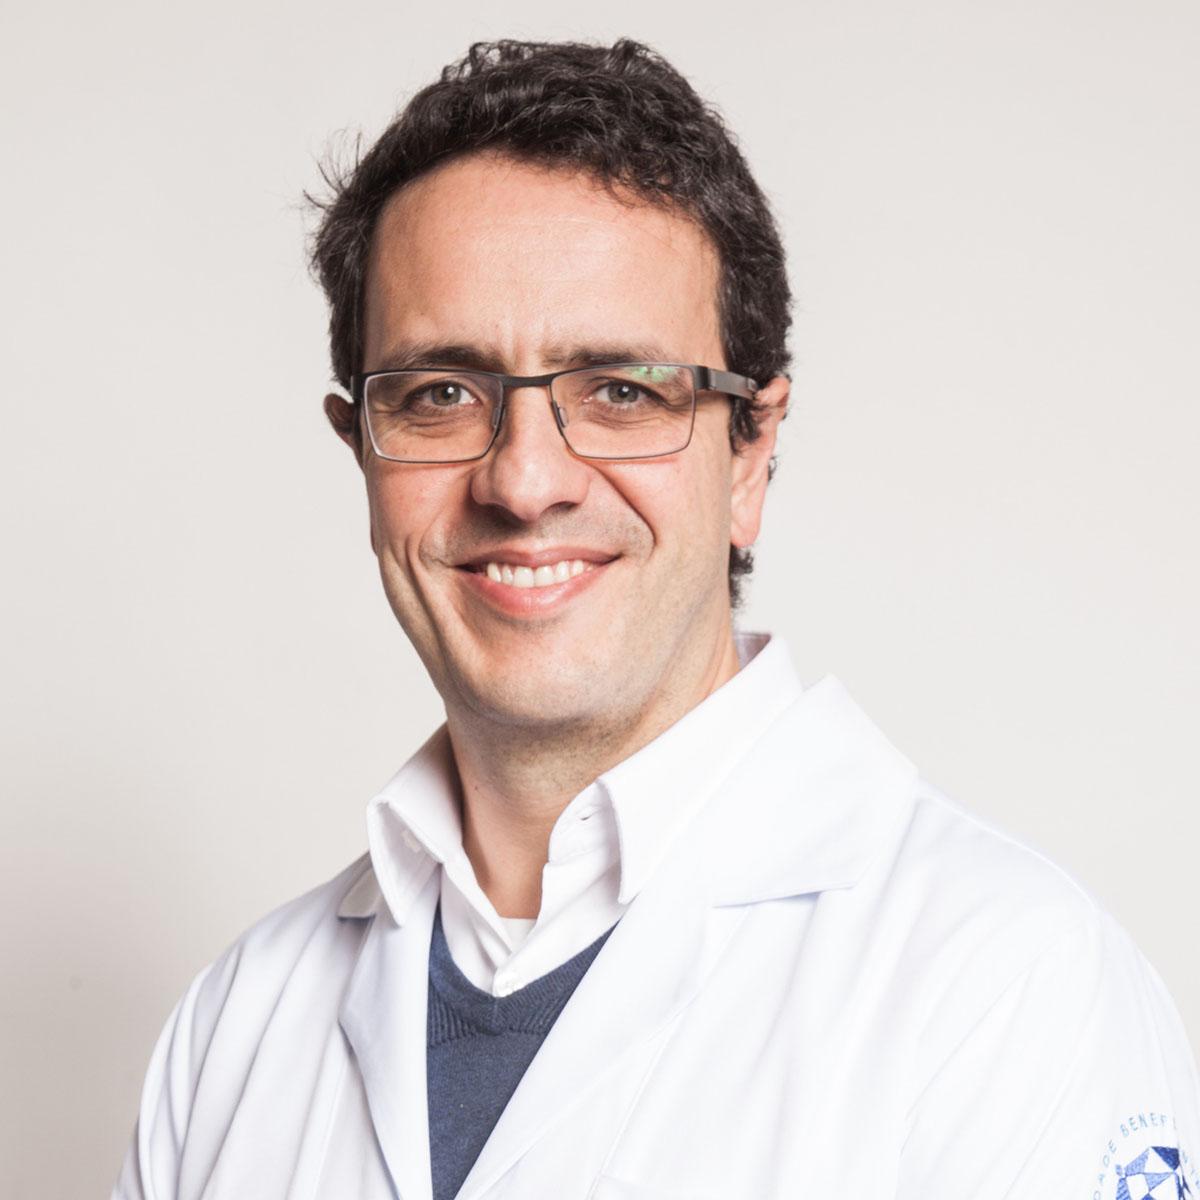 Dr. Daniel Neves Forte